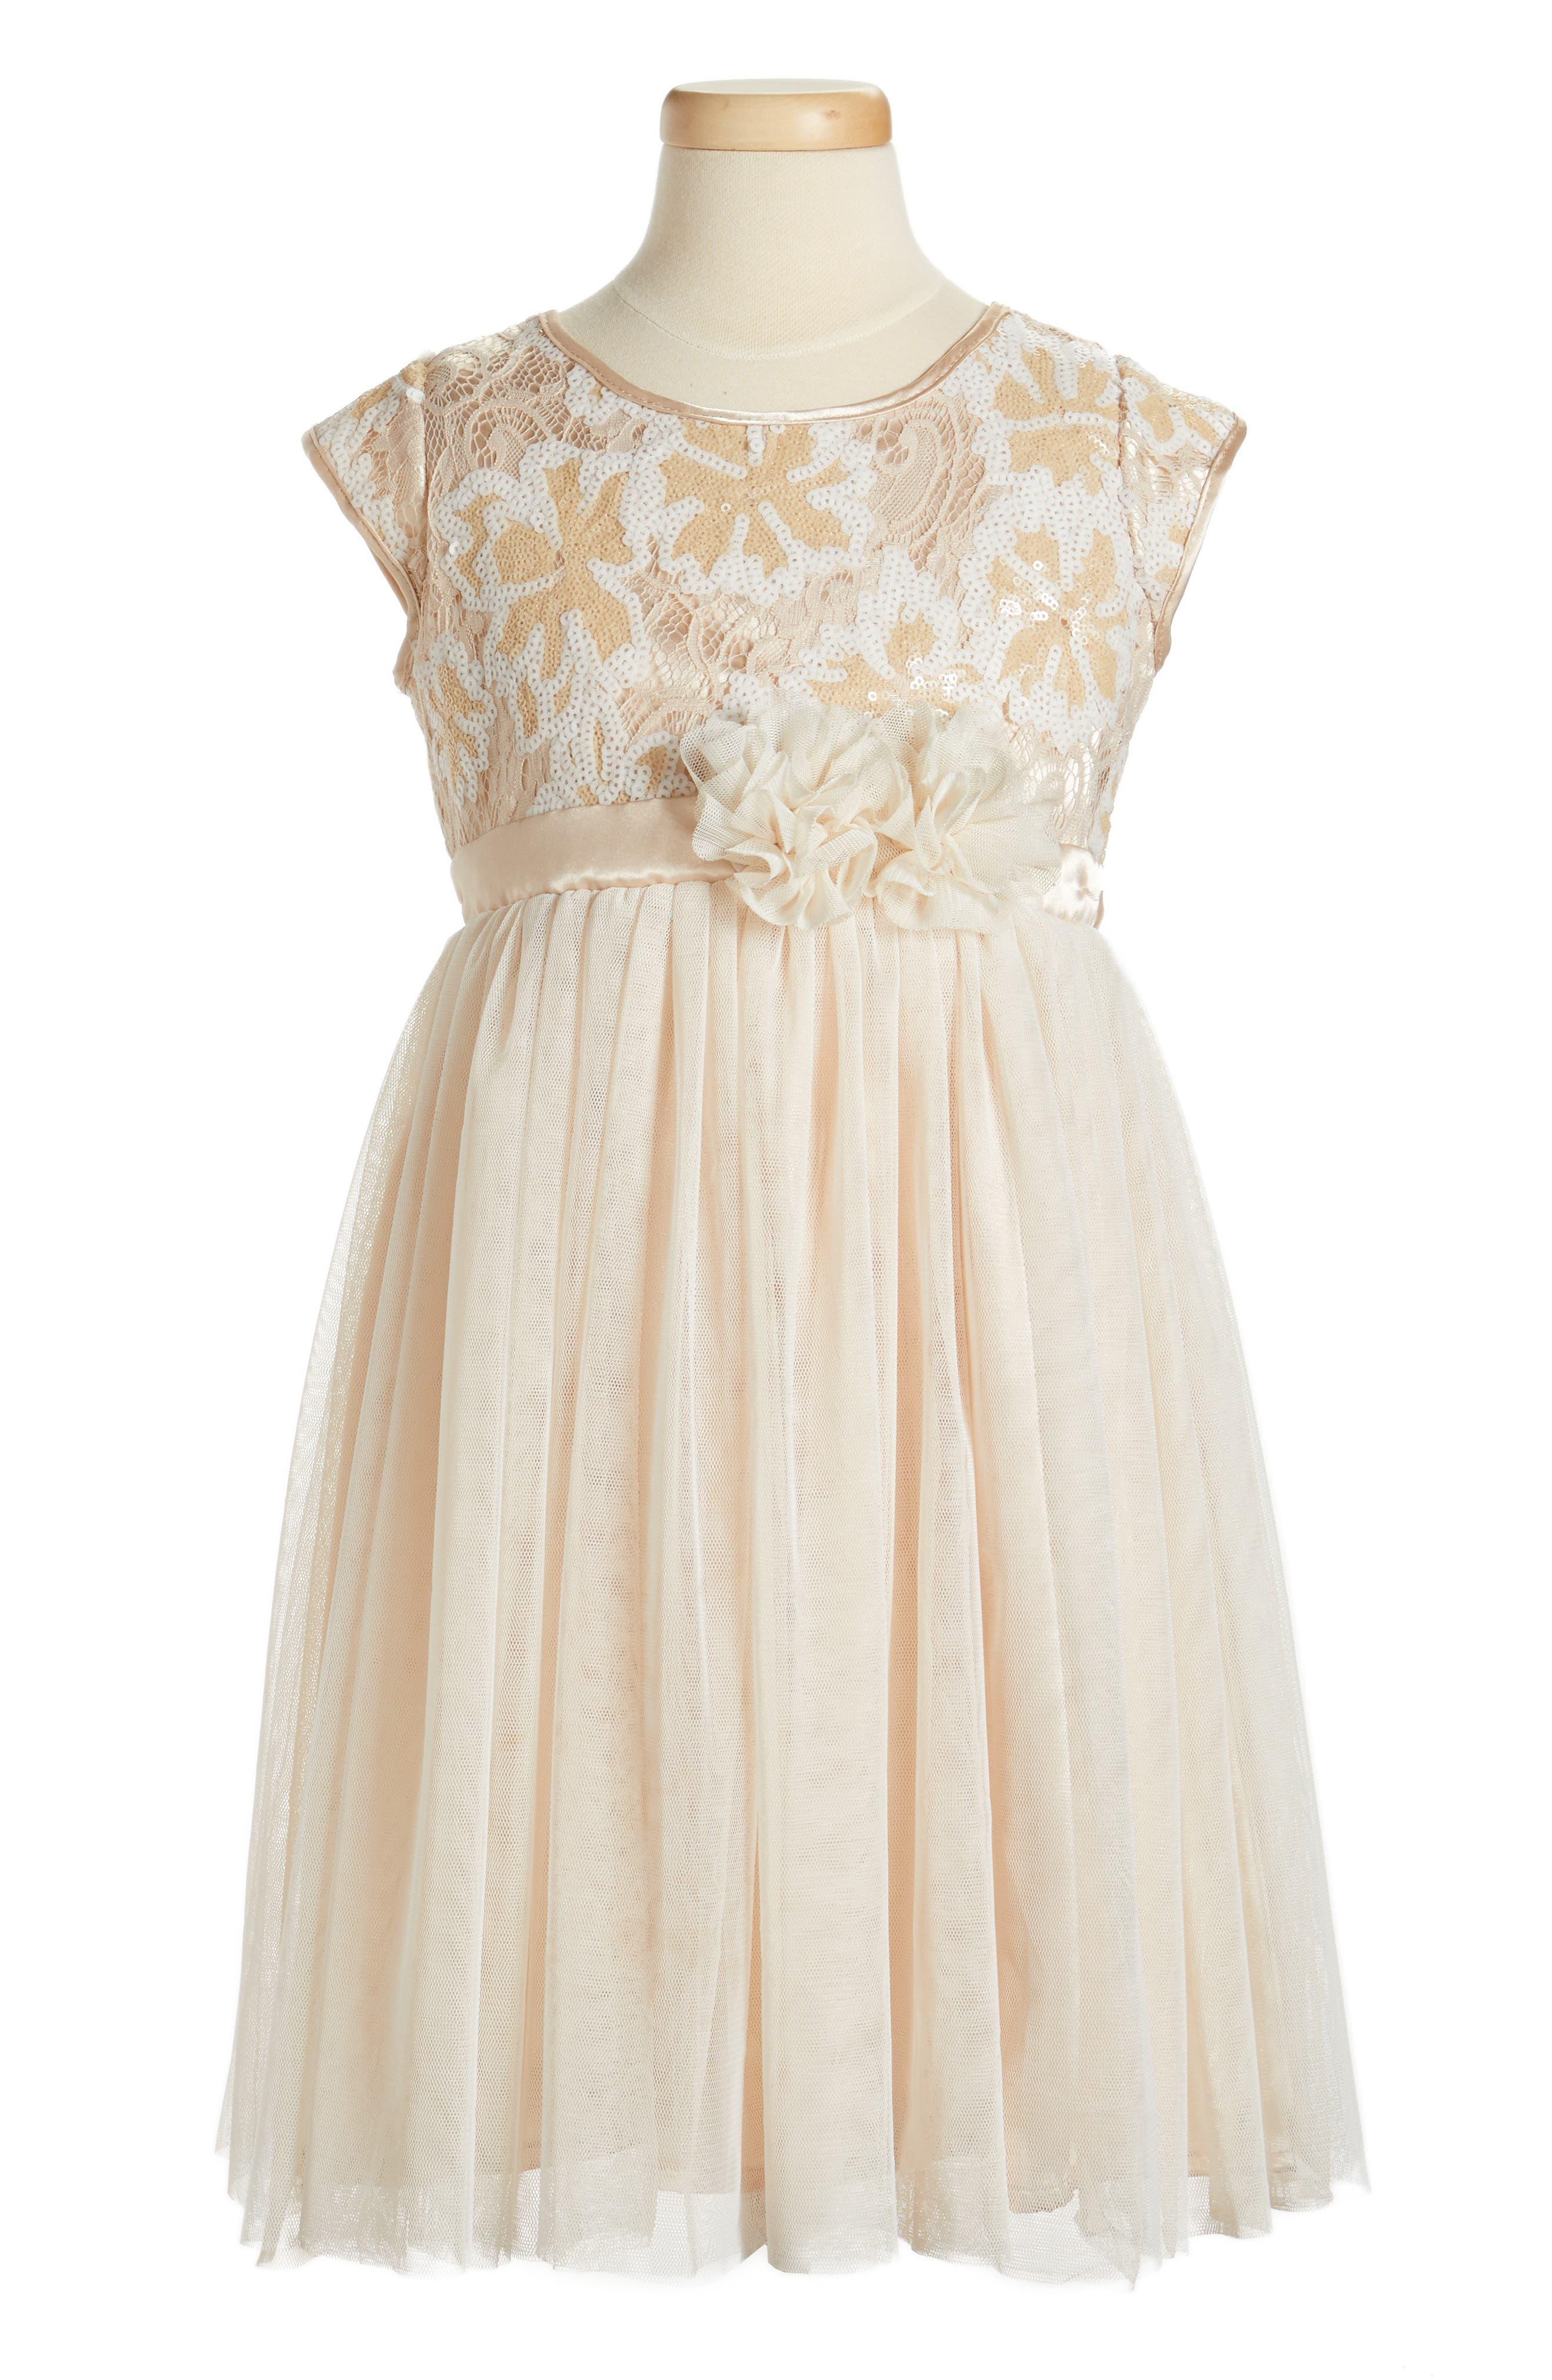 Sequin Flower Dress,                         Main,                         color, Ivory